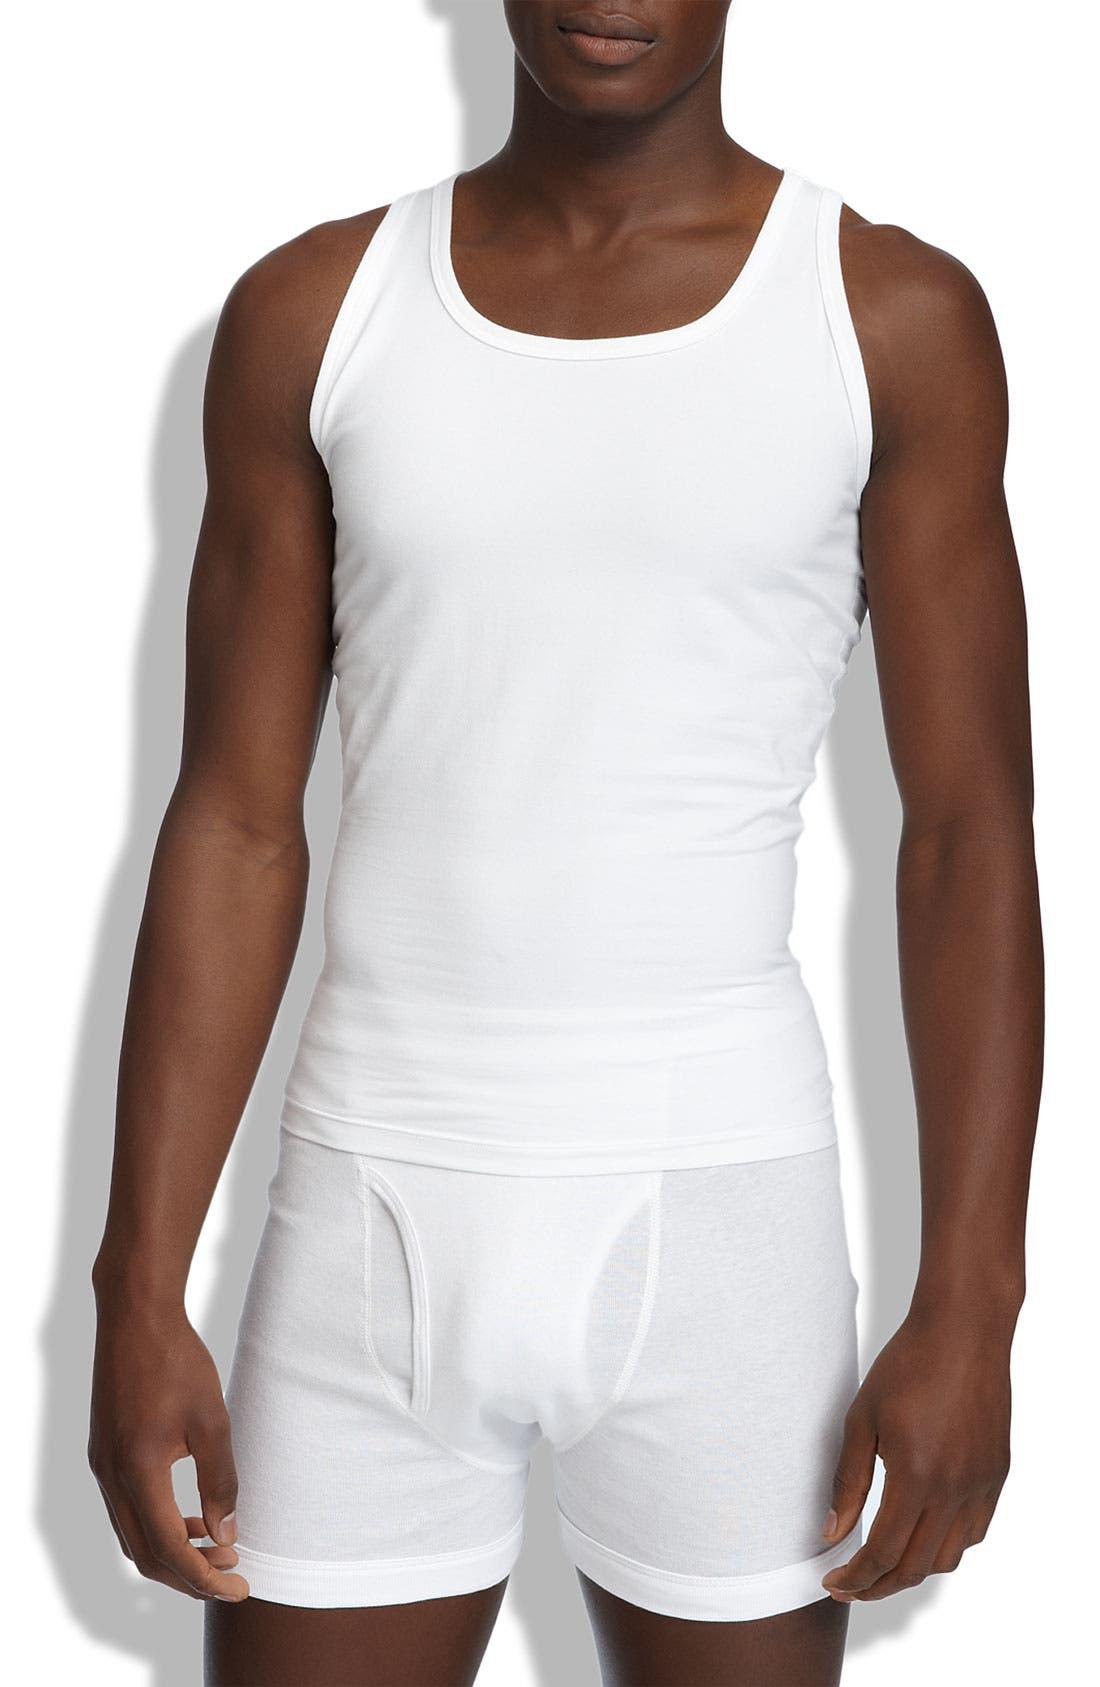 Cheap dress boots mens undershirts